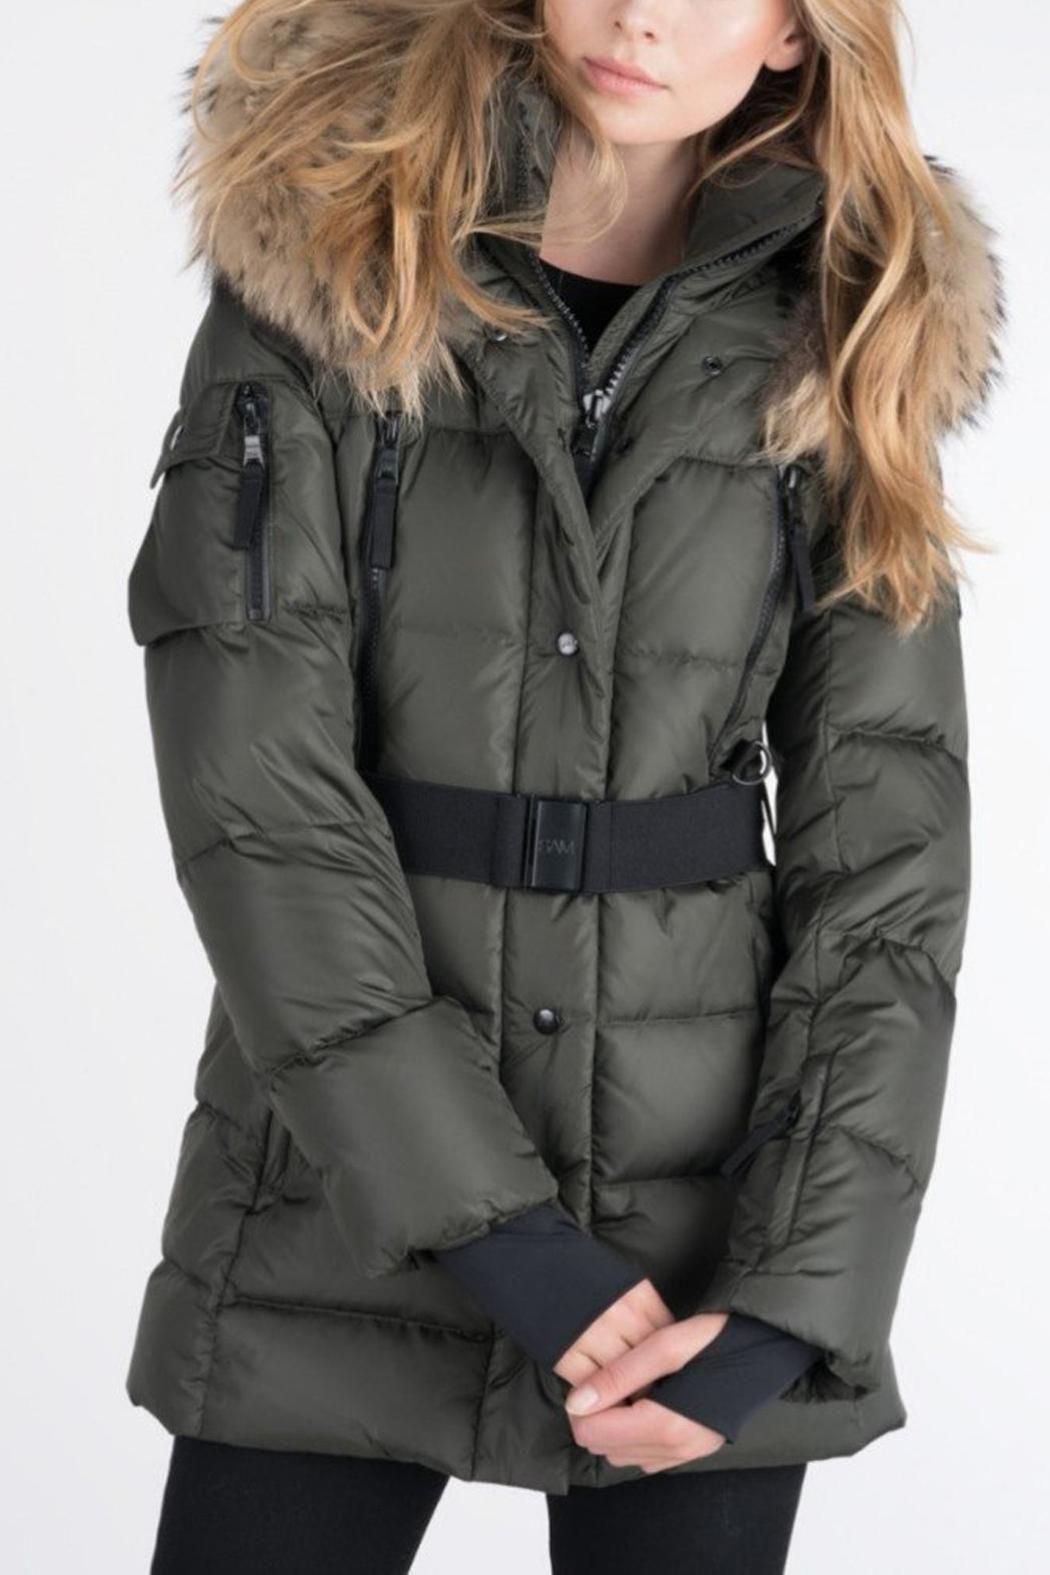 Sam Matte Millenium Winter Coats Jackets Luxury Outerwear Winter Jackets [ 1575 x 1050 Pixel ]